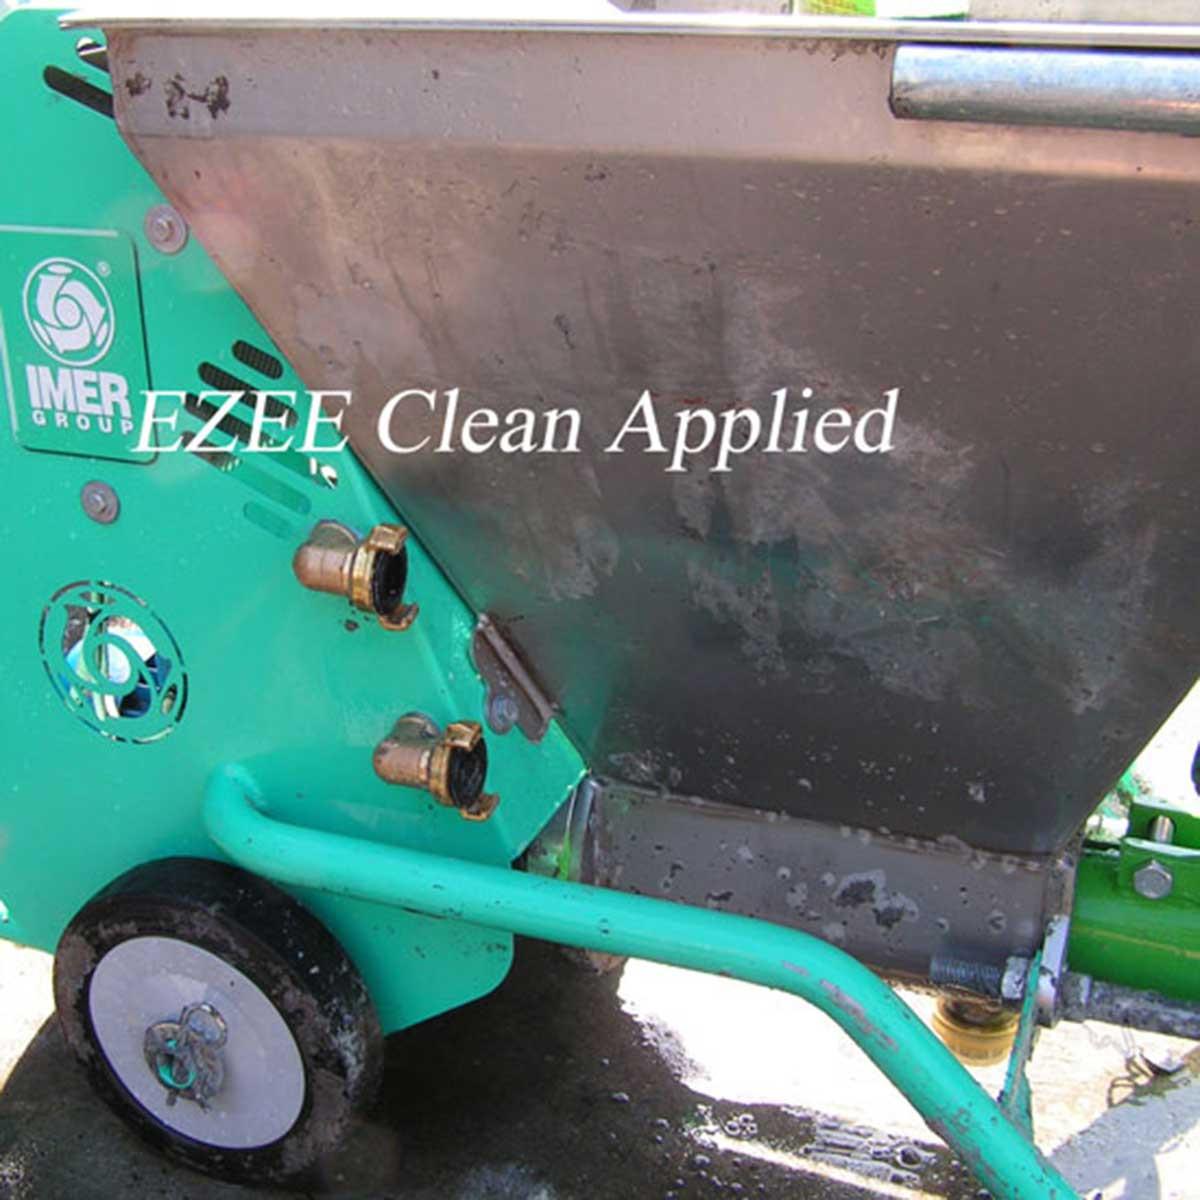 Imer Ezee Clean applied